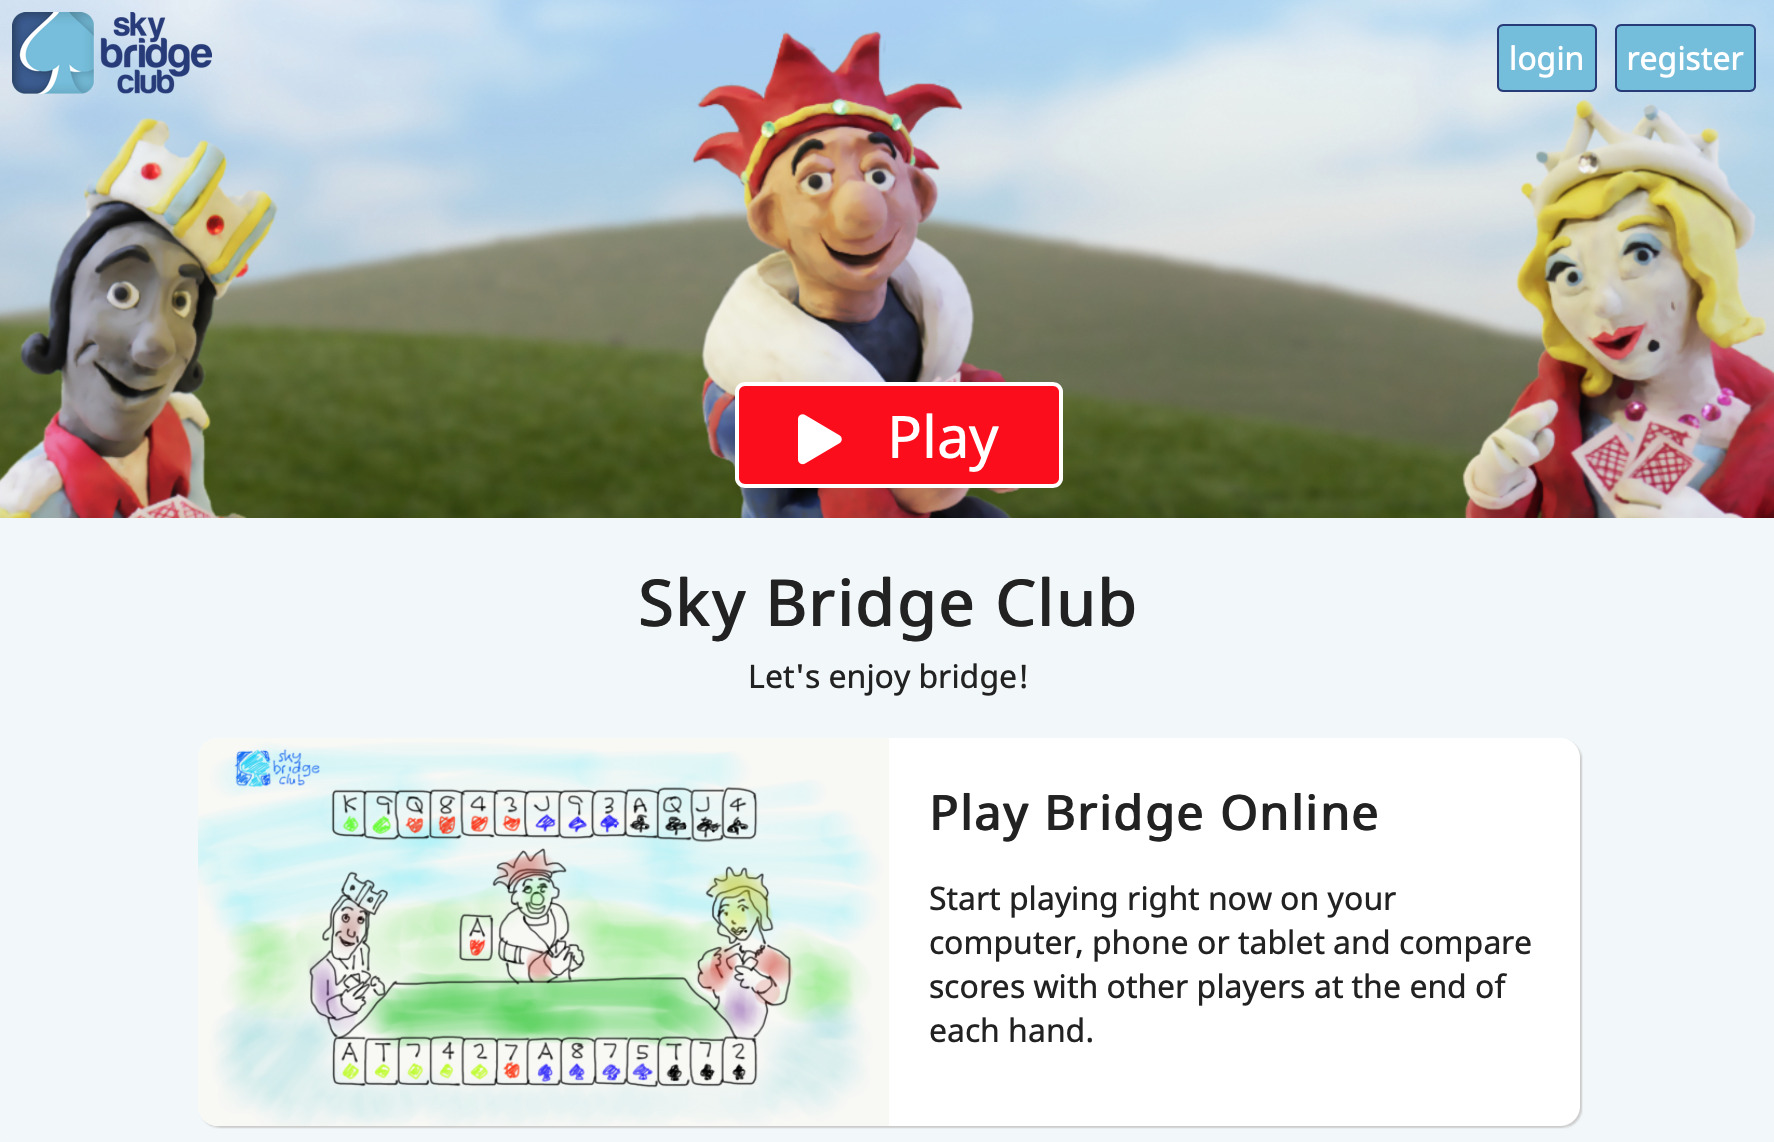 image of sky bridge club home page